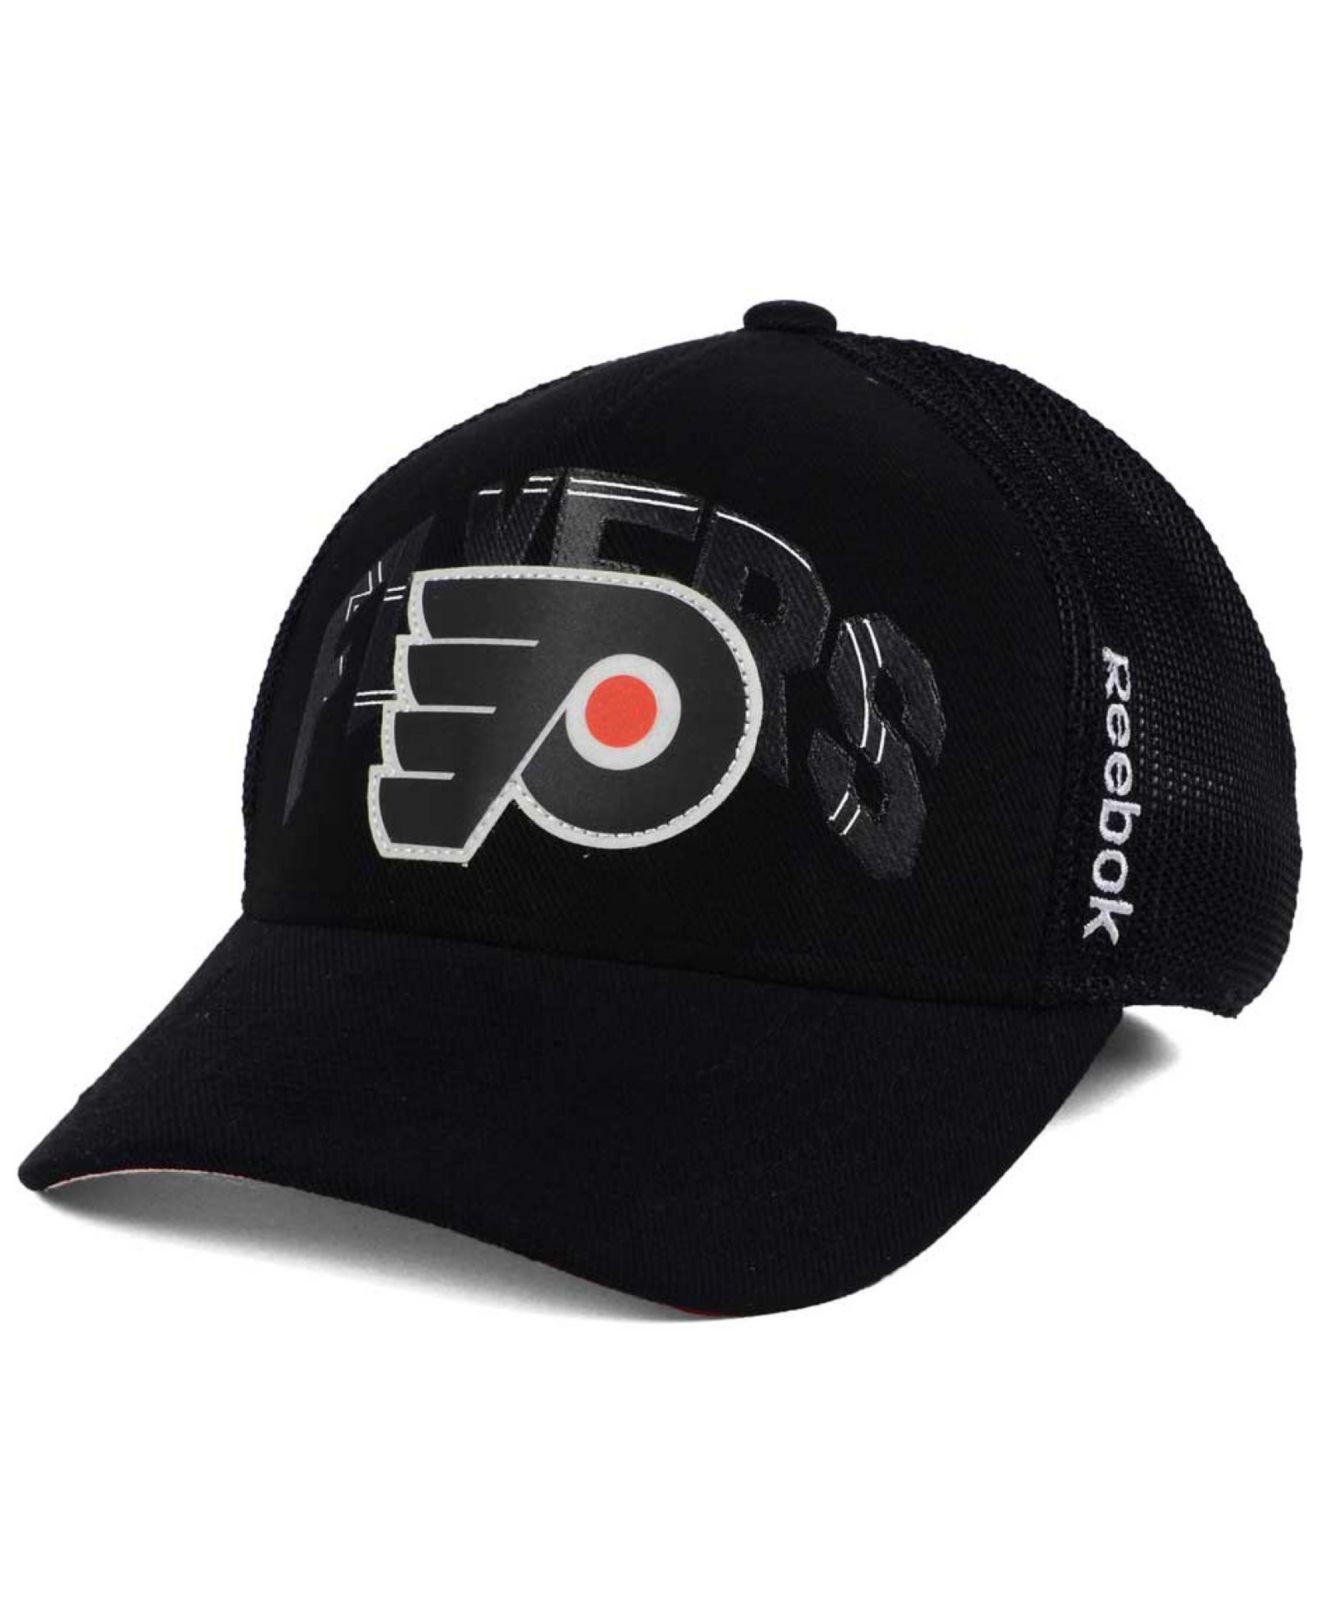 0f17a906629d9 Lyst - Reebok Philadelphia Flyers Stadium Series Coaches Flex Cap in ...